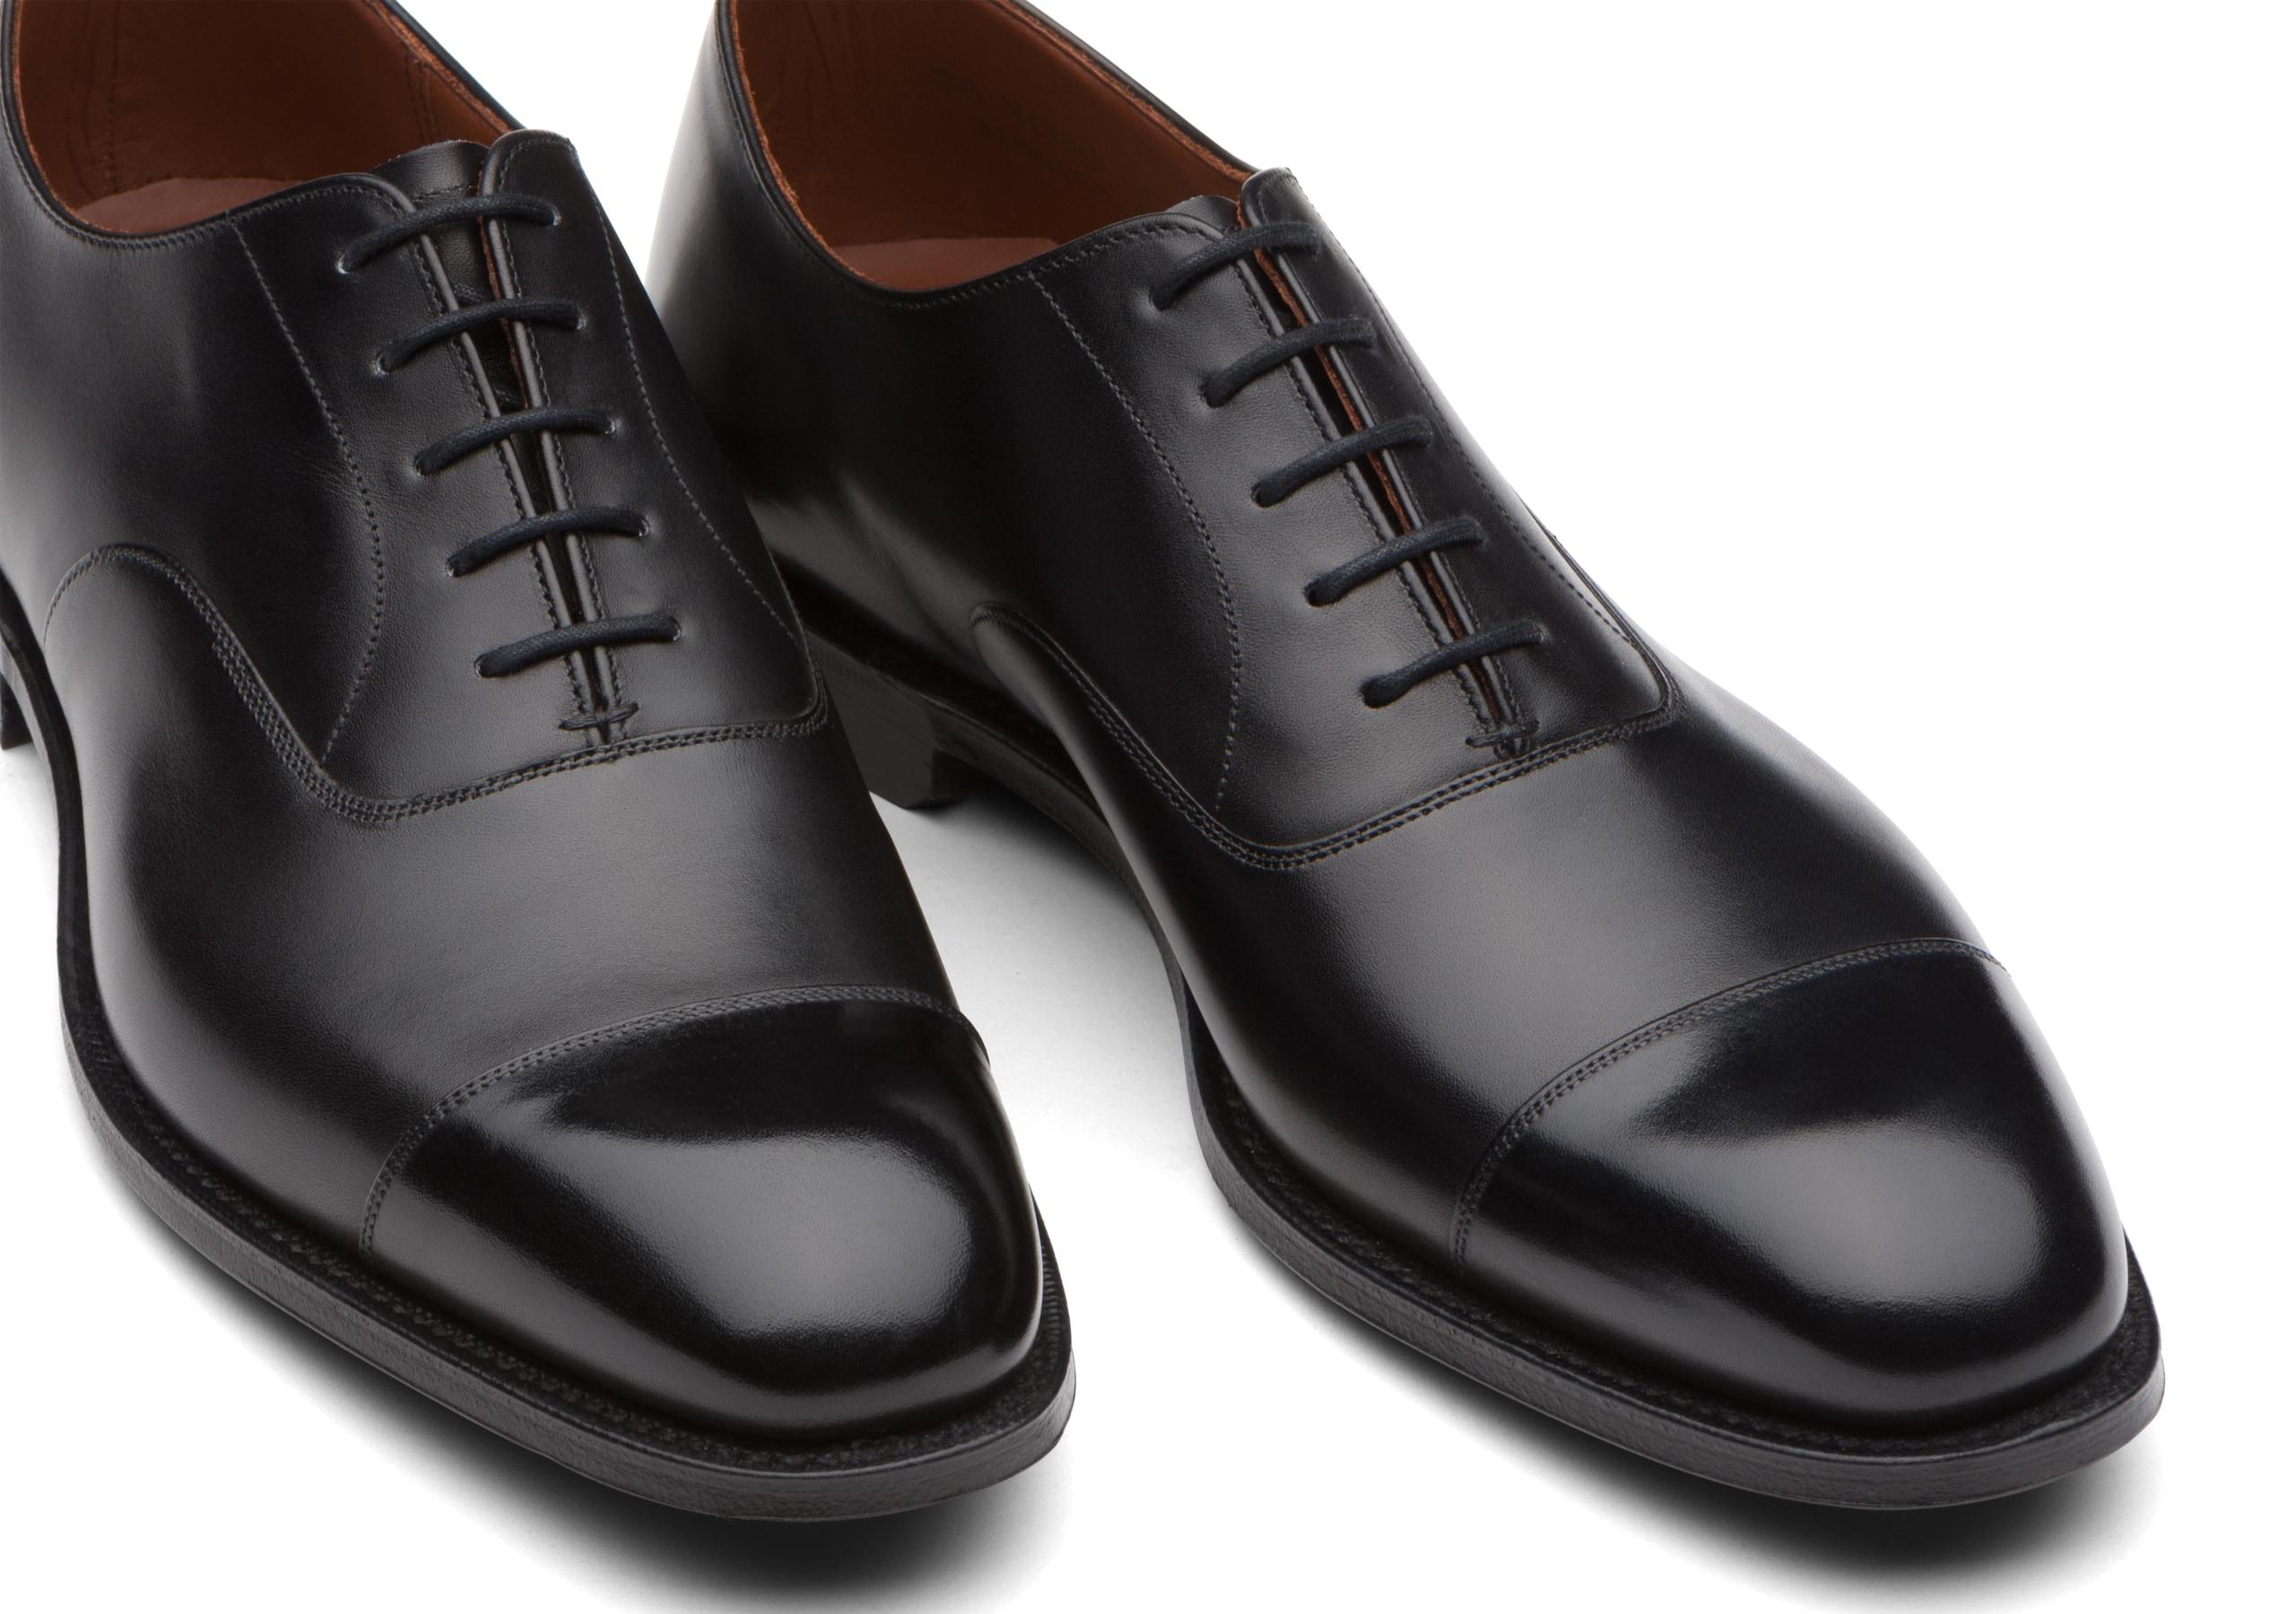 Consul 1945 Church's Limited Edition Calf Leather Oxford Black